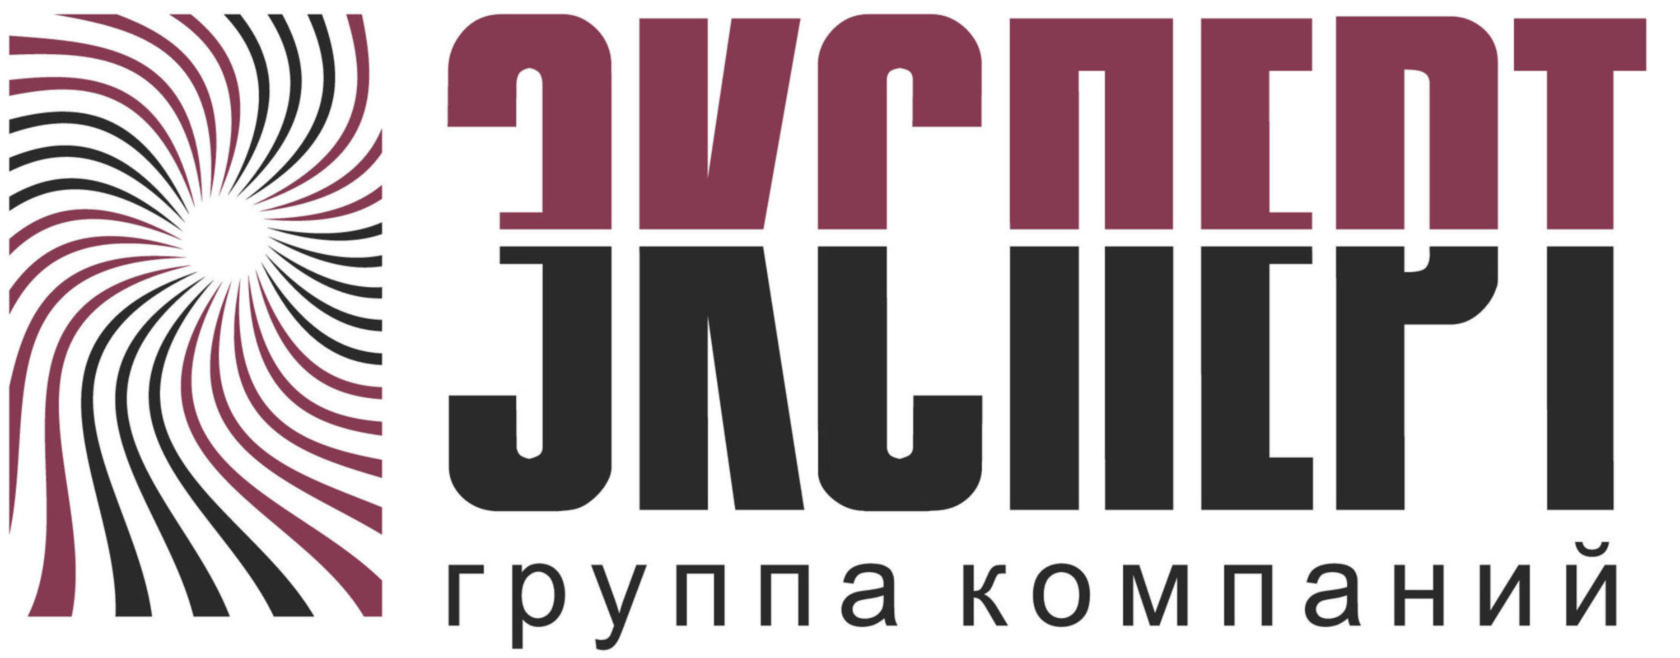 "Группа компаний ""Эксперт"""